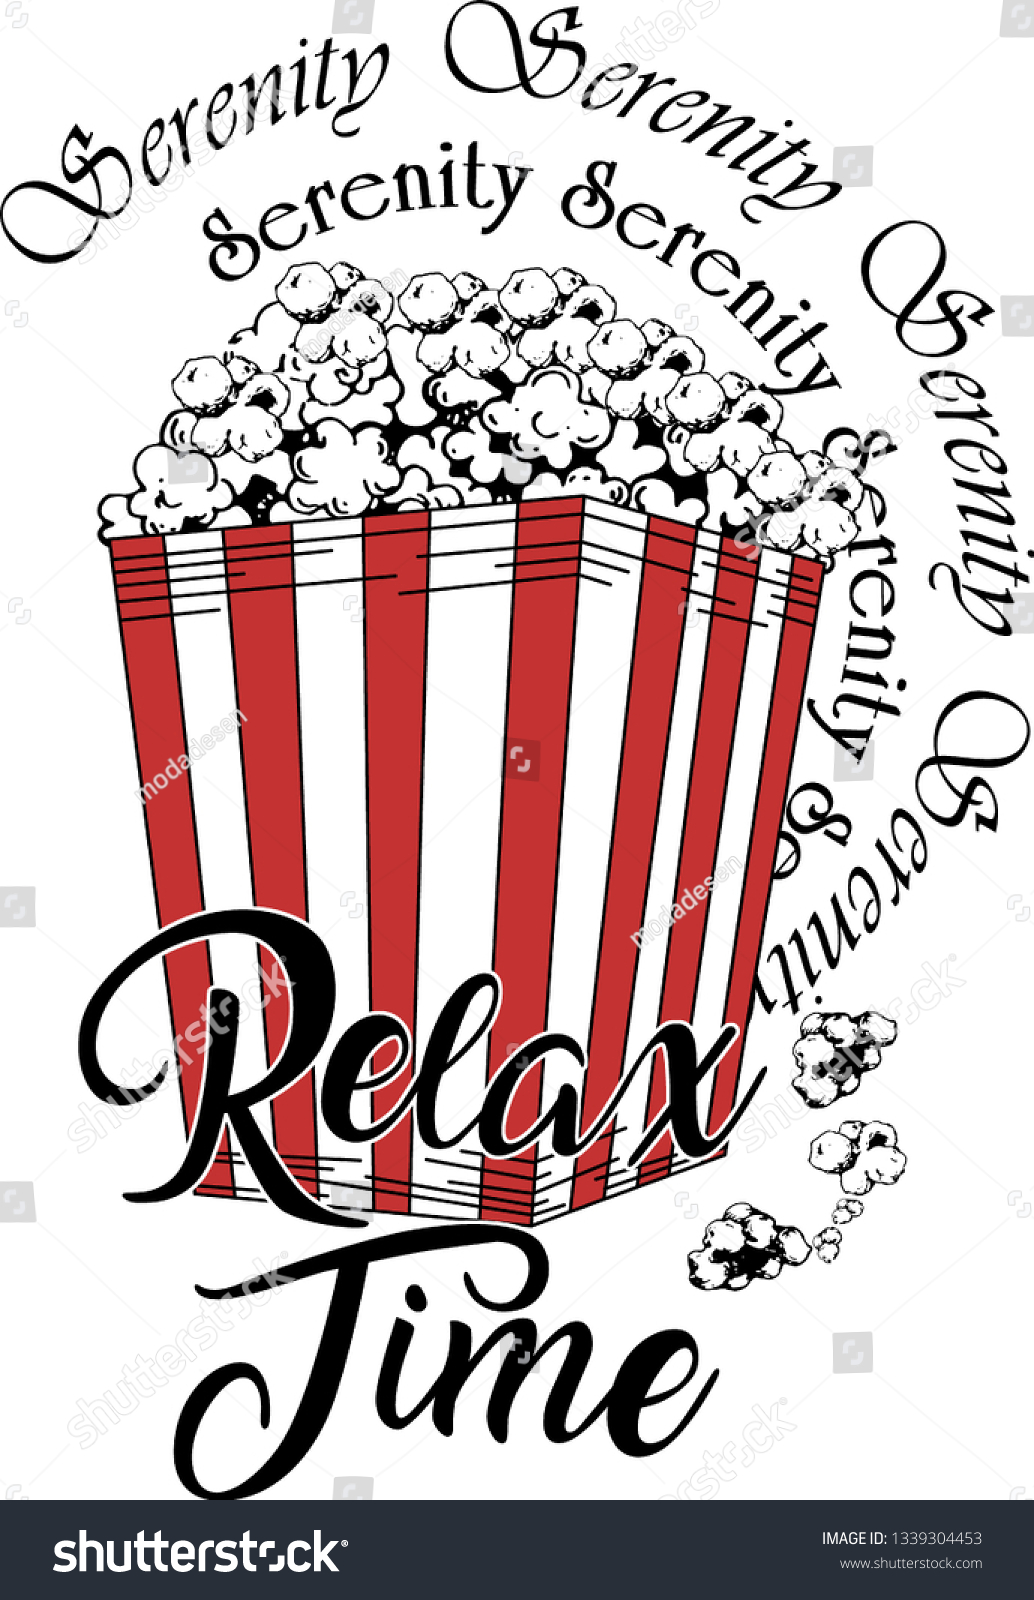 dac1a5a79 Pop Corn Slogan Tshirt Design Relax Stock Vector (Royalty Free ...